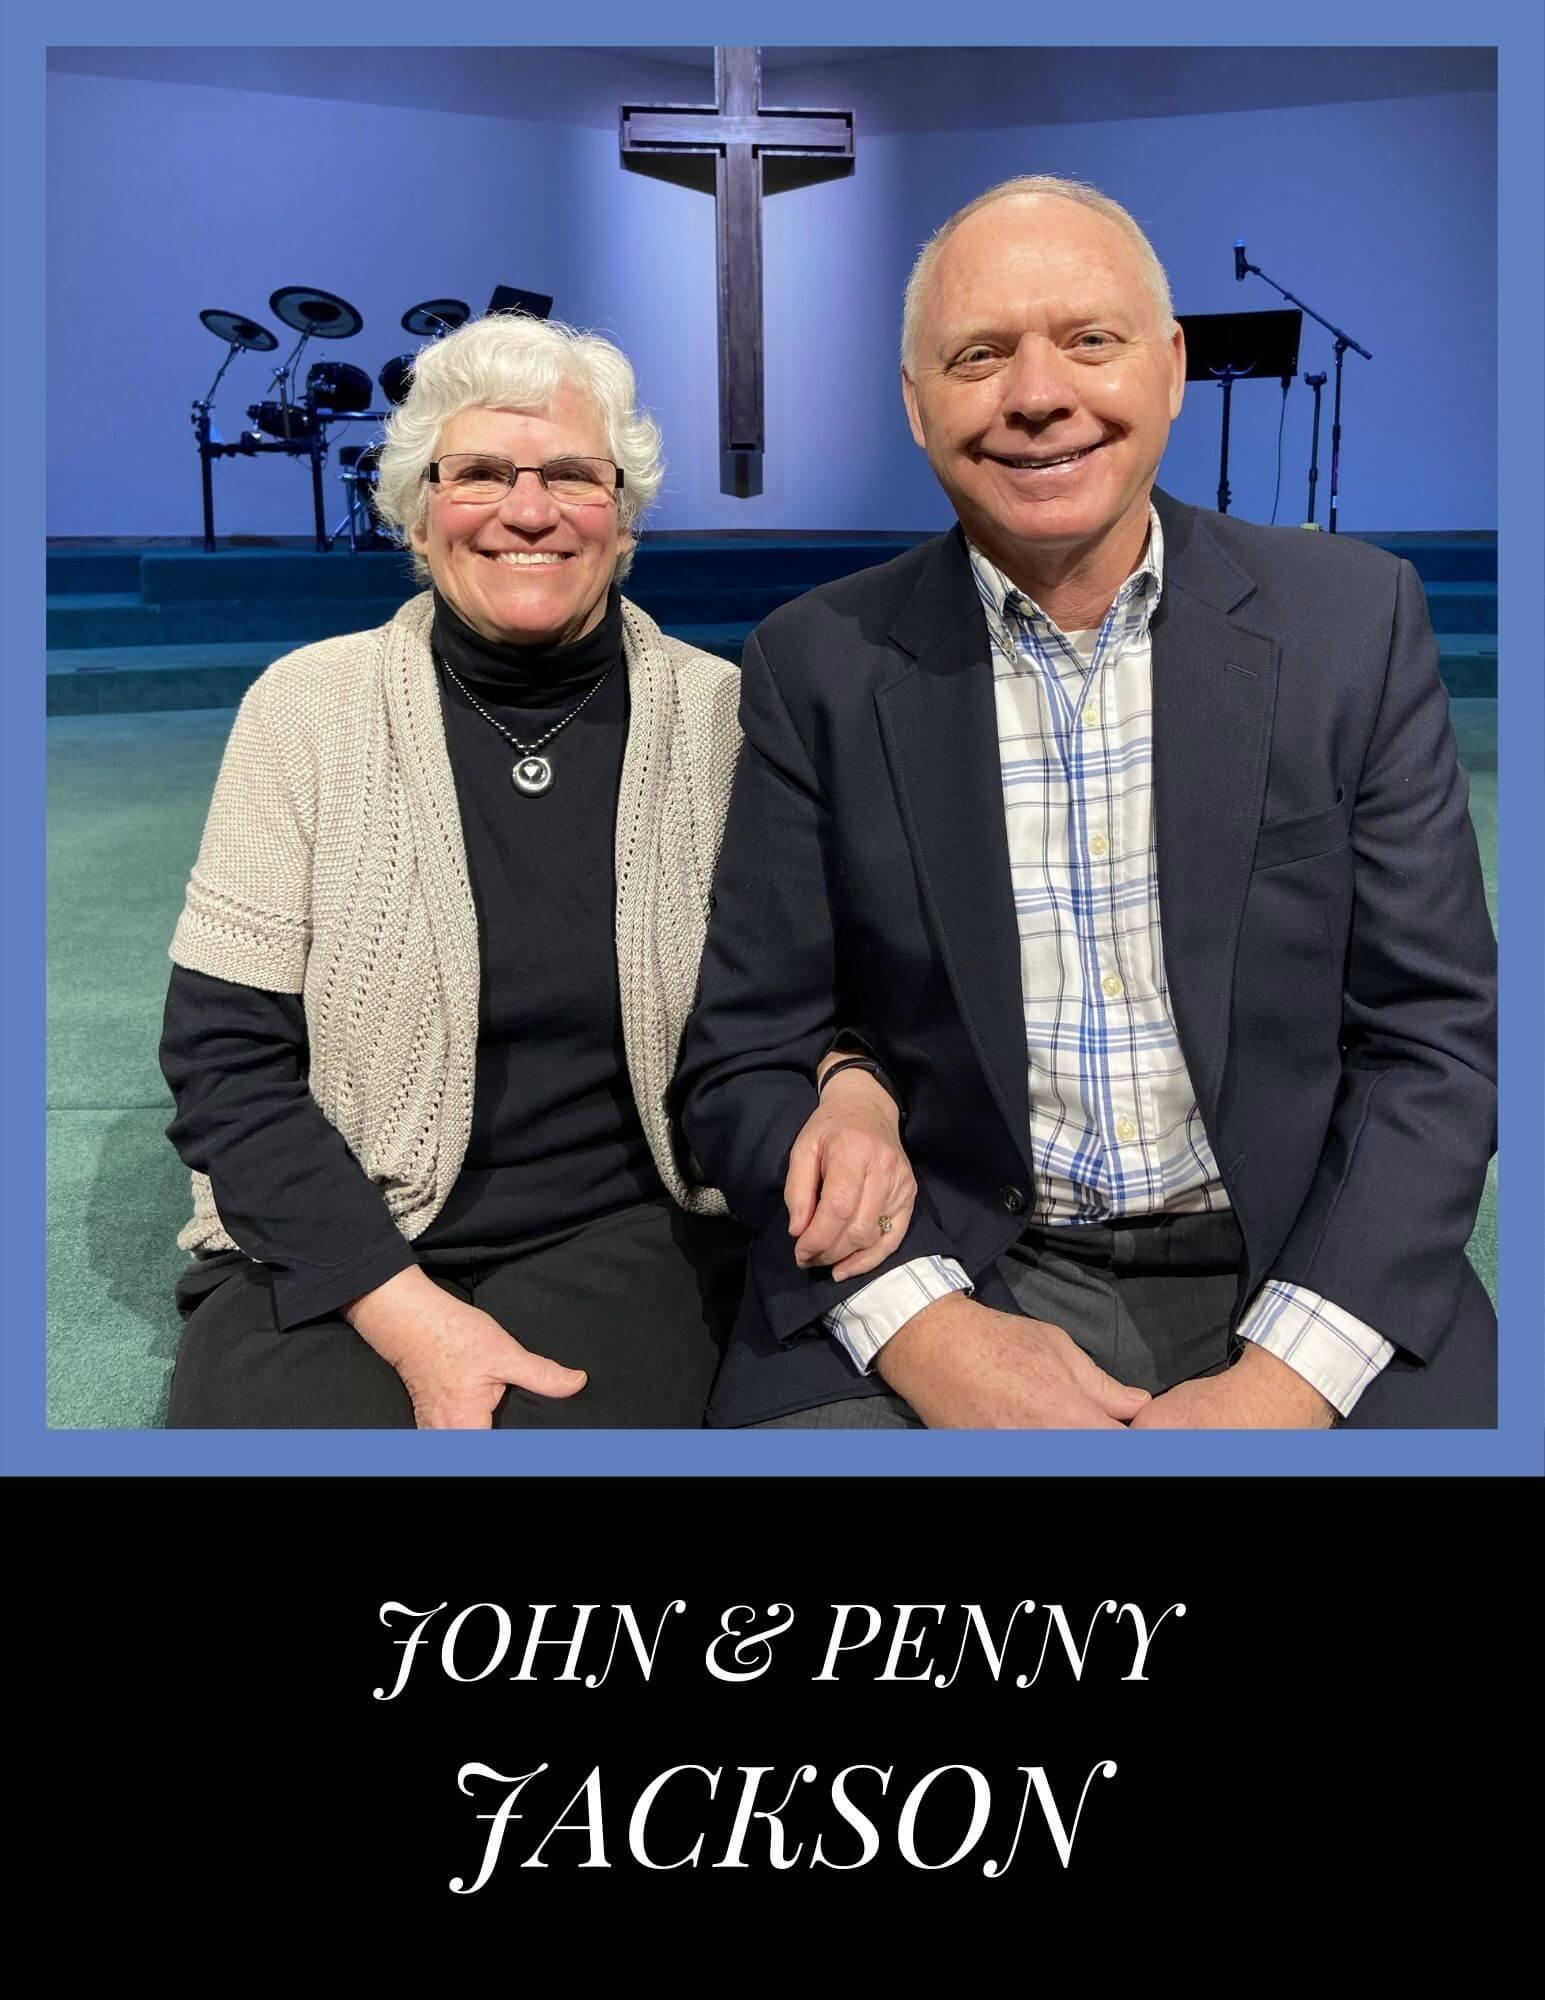 Missionaries John and Penny Jackson